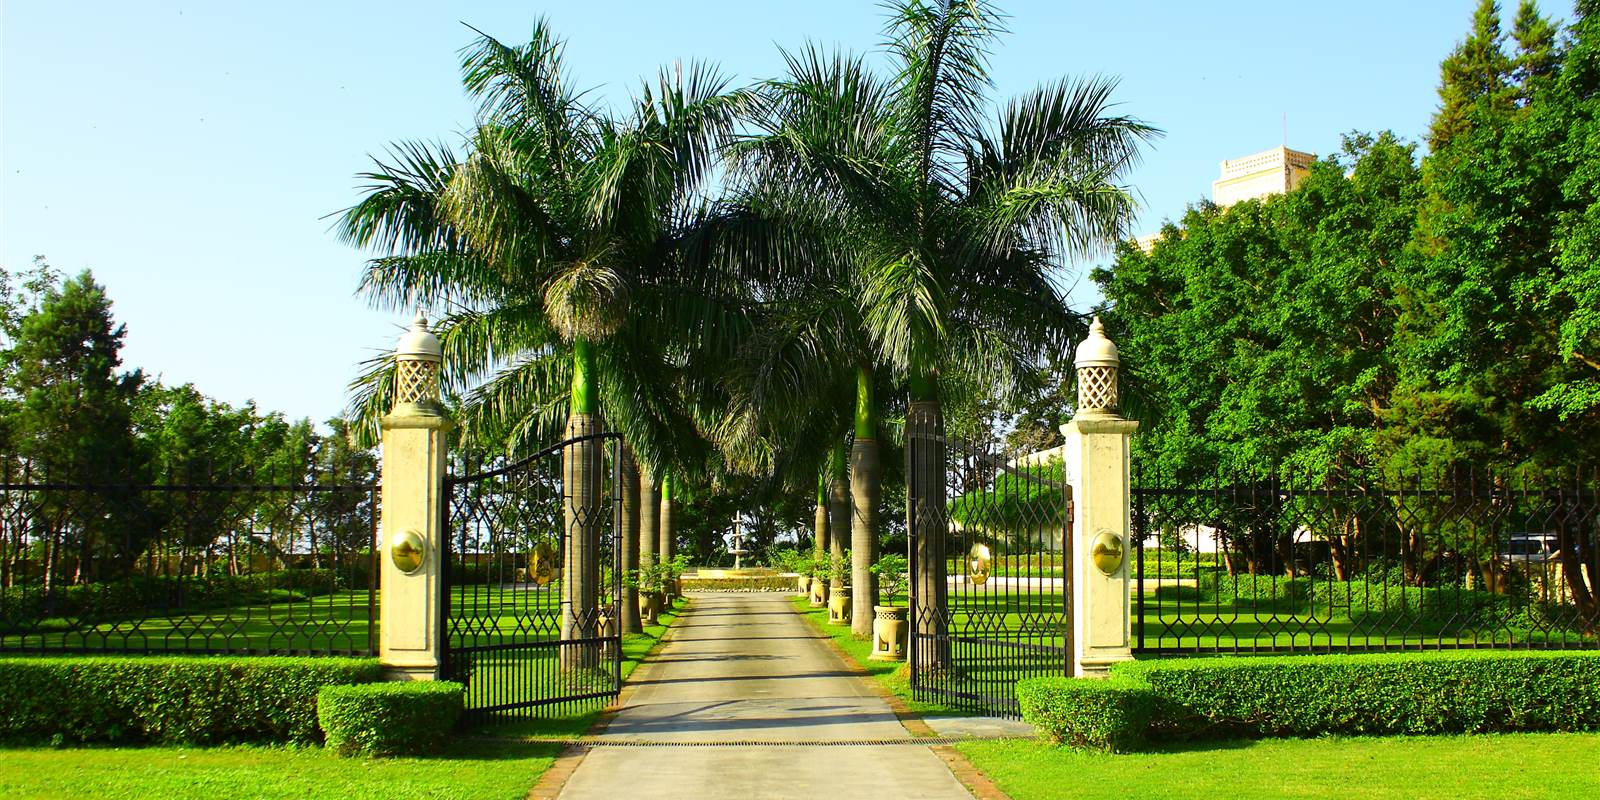 Spa Ananda Entrance Photo Thomas Gallagh